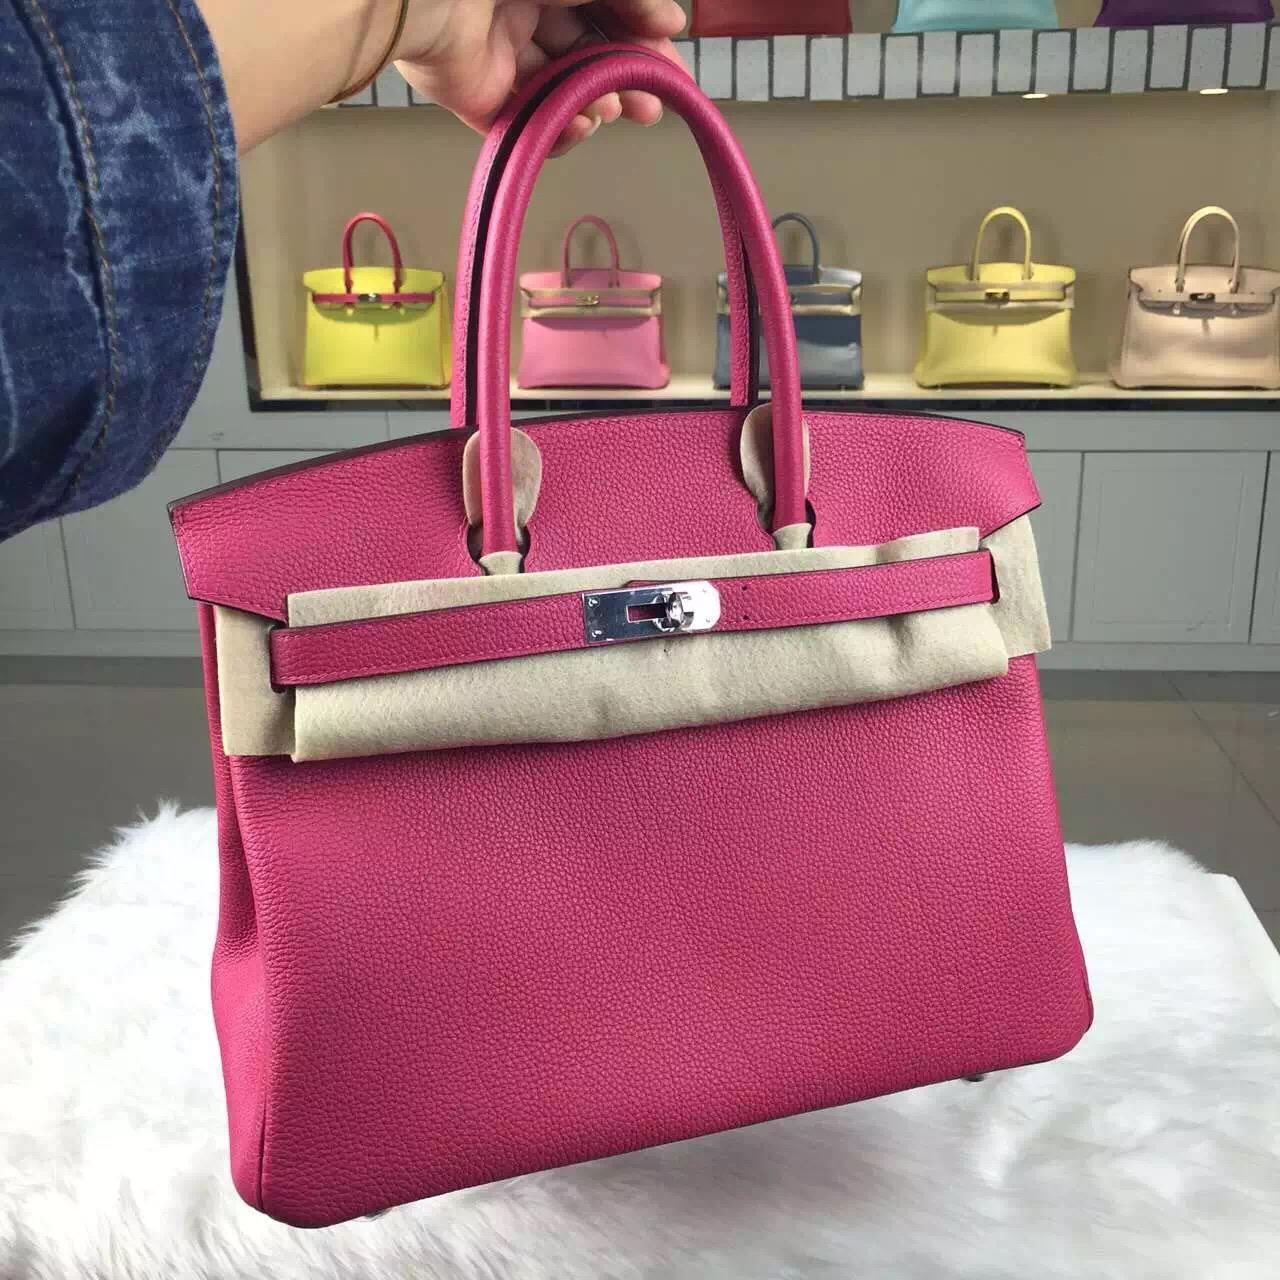 Custom-made Hermes Hot Pink Togo Leather Birkin30 Ladies' Tote Bag